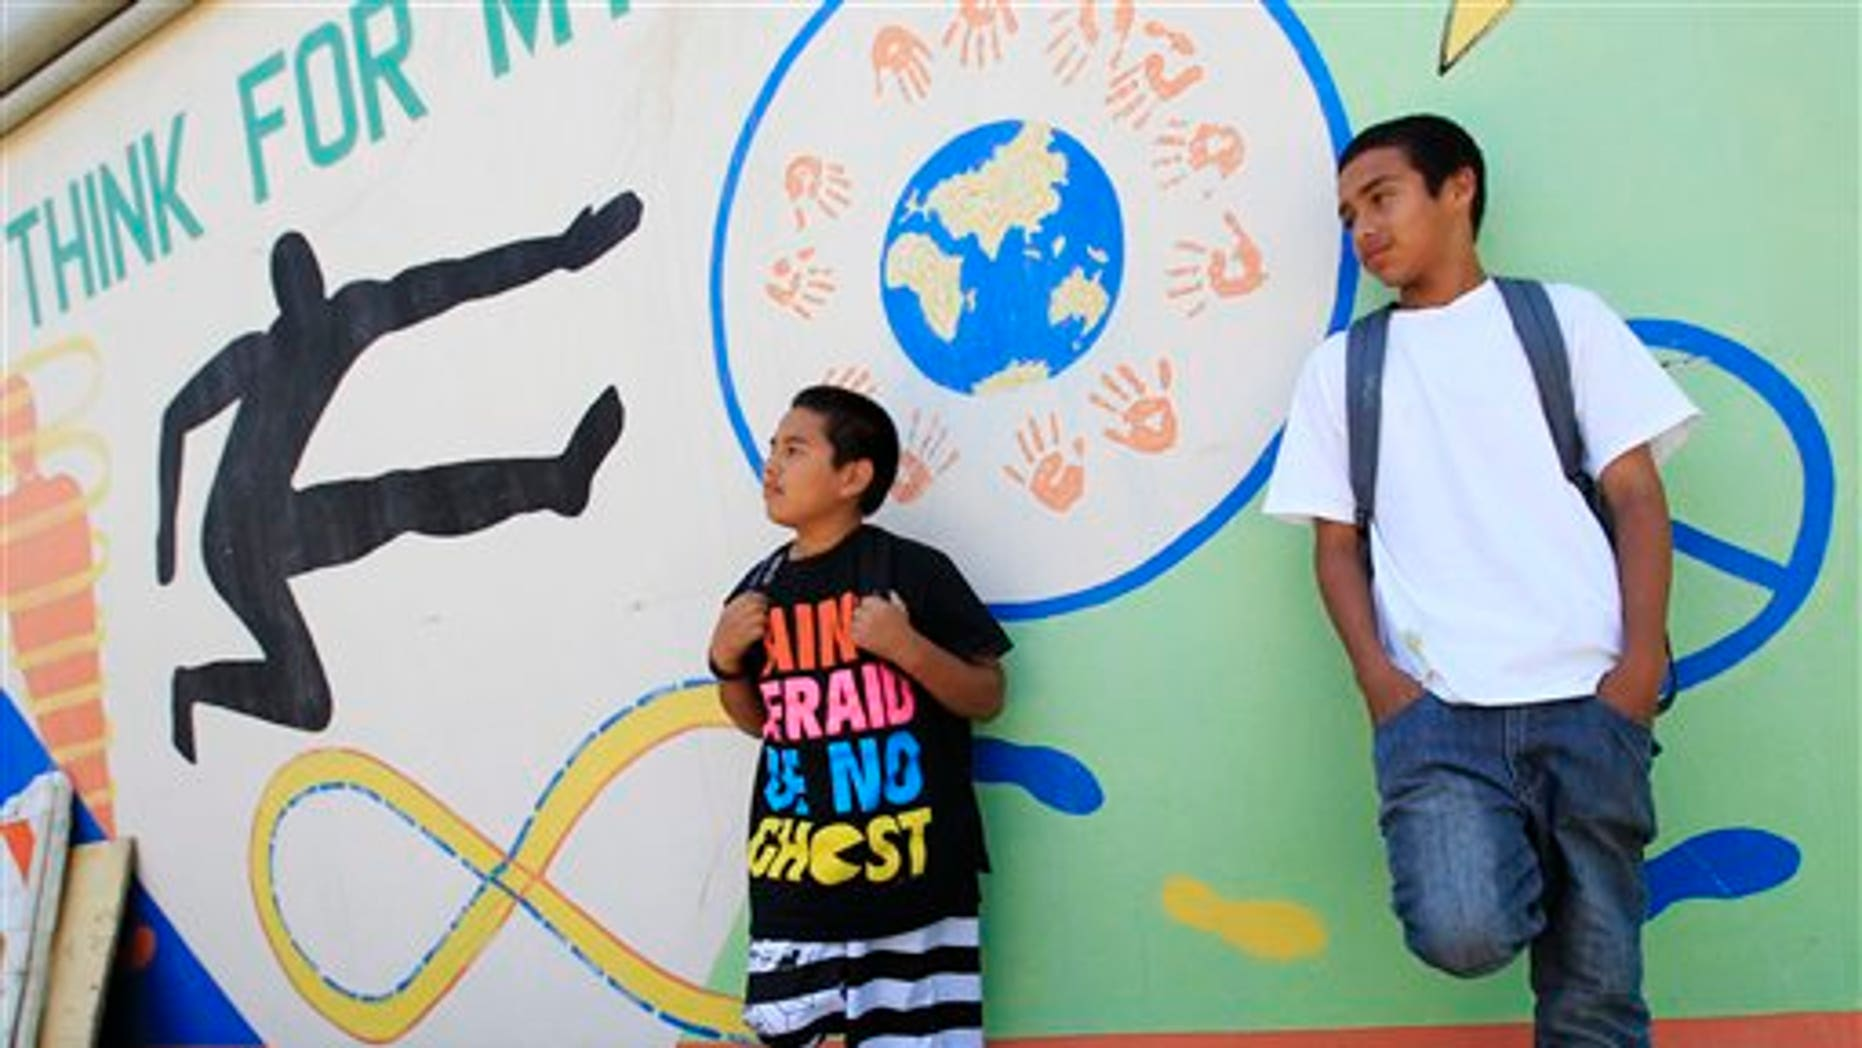 May 10: Van Buren Elementary school seventh grade students take a break at school in Stockton, California.